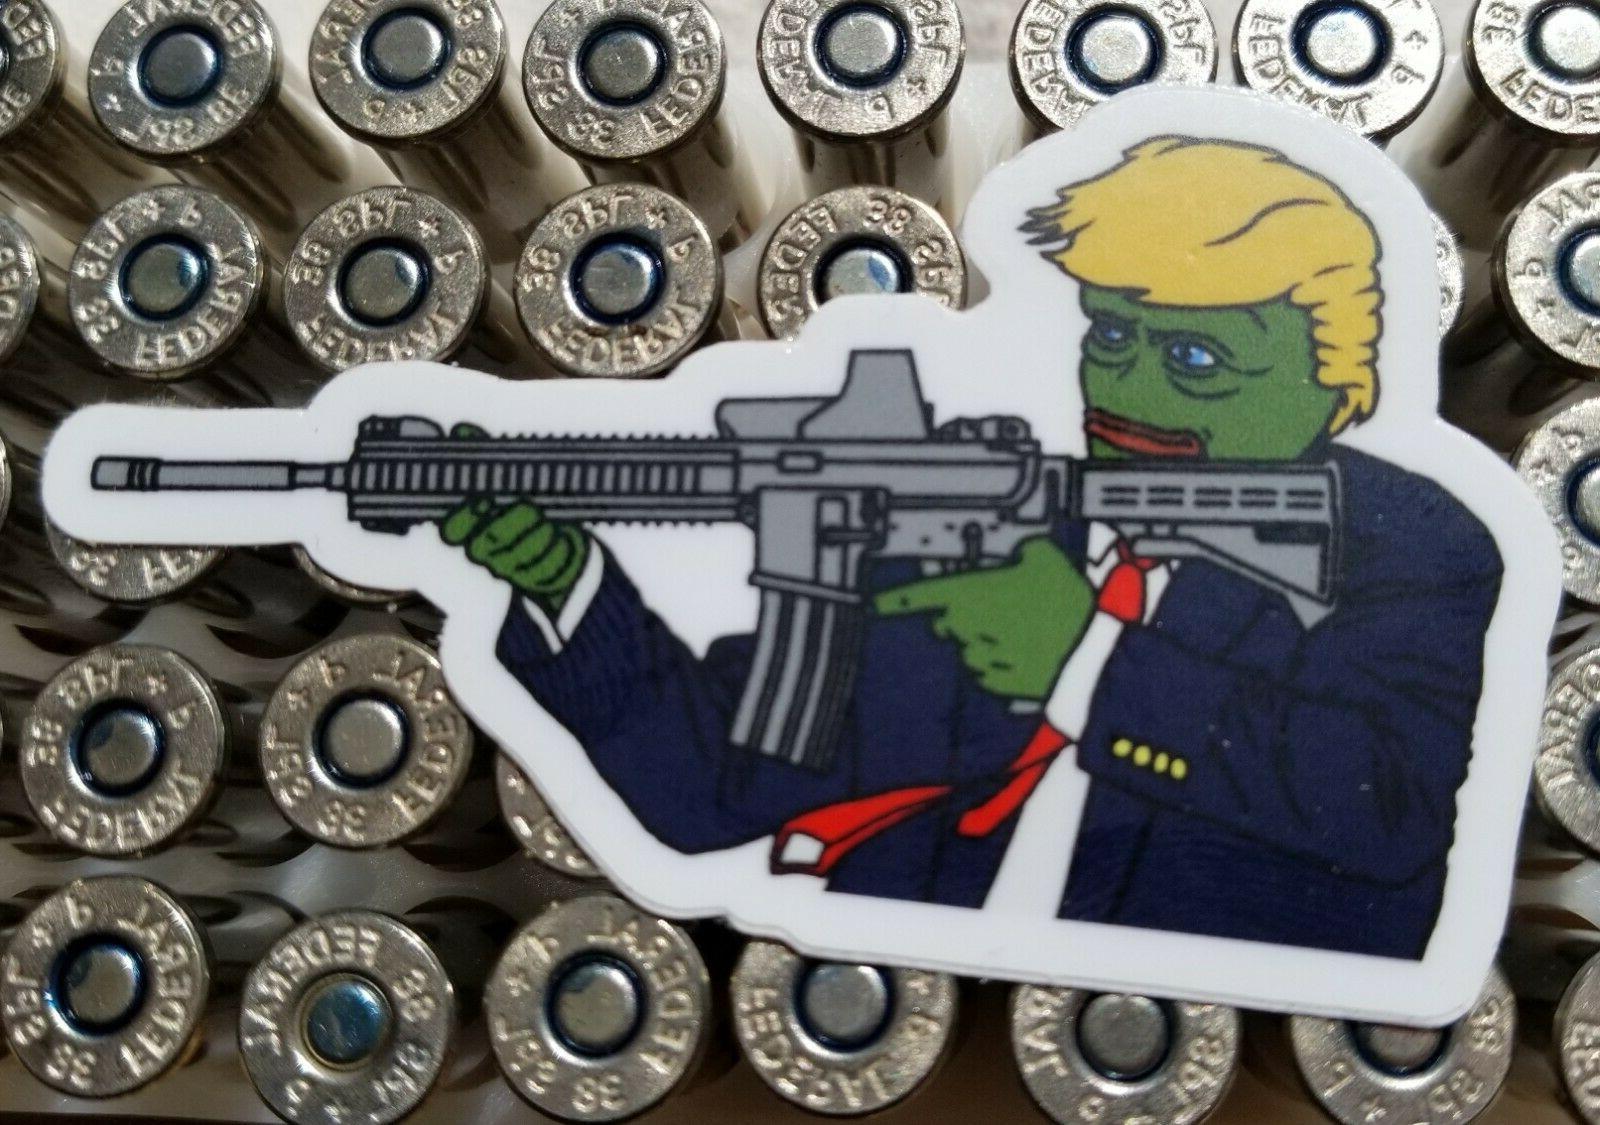 NEW Donald Trump Here Rubber $20s + TWO RARE PEPE Custom